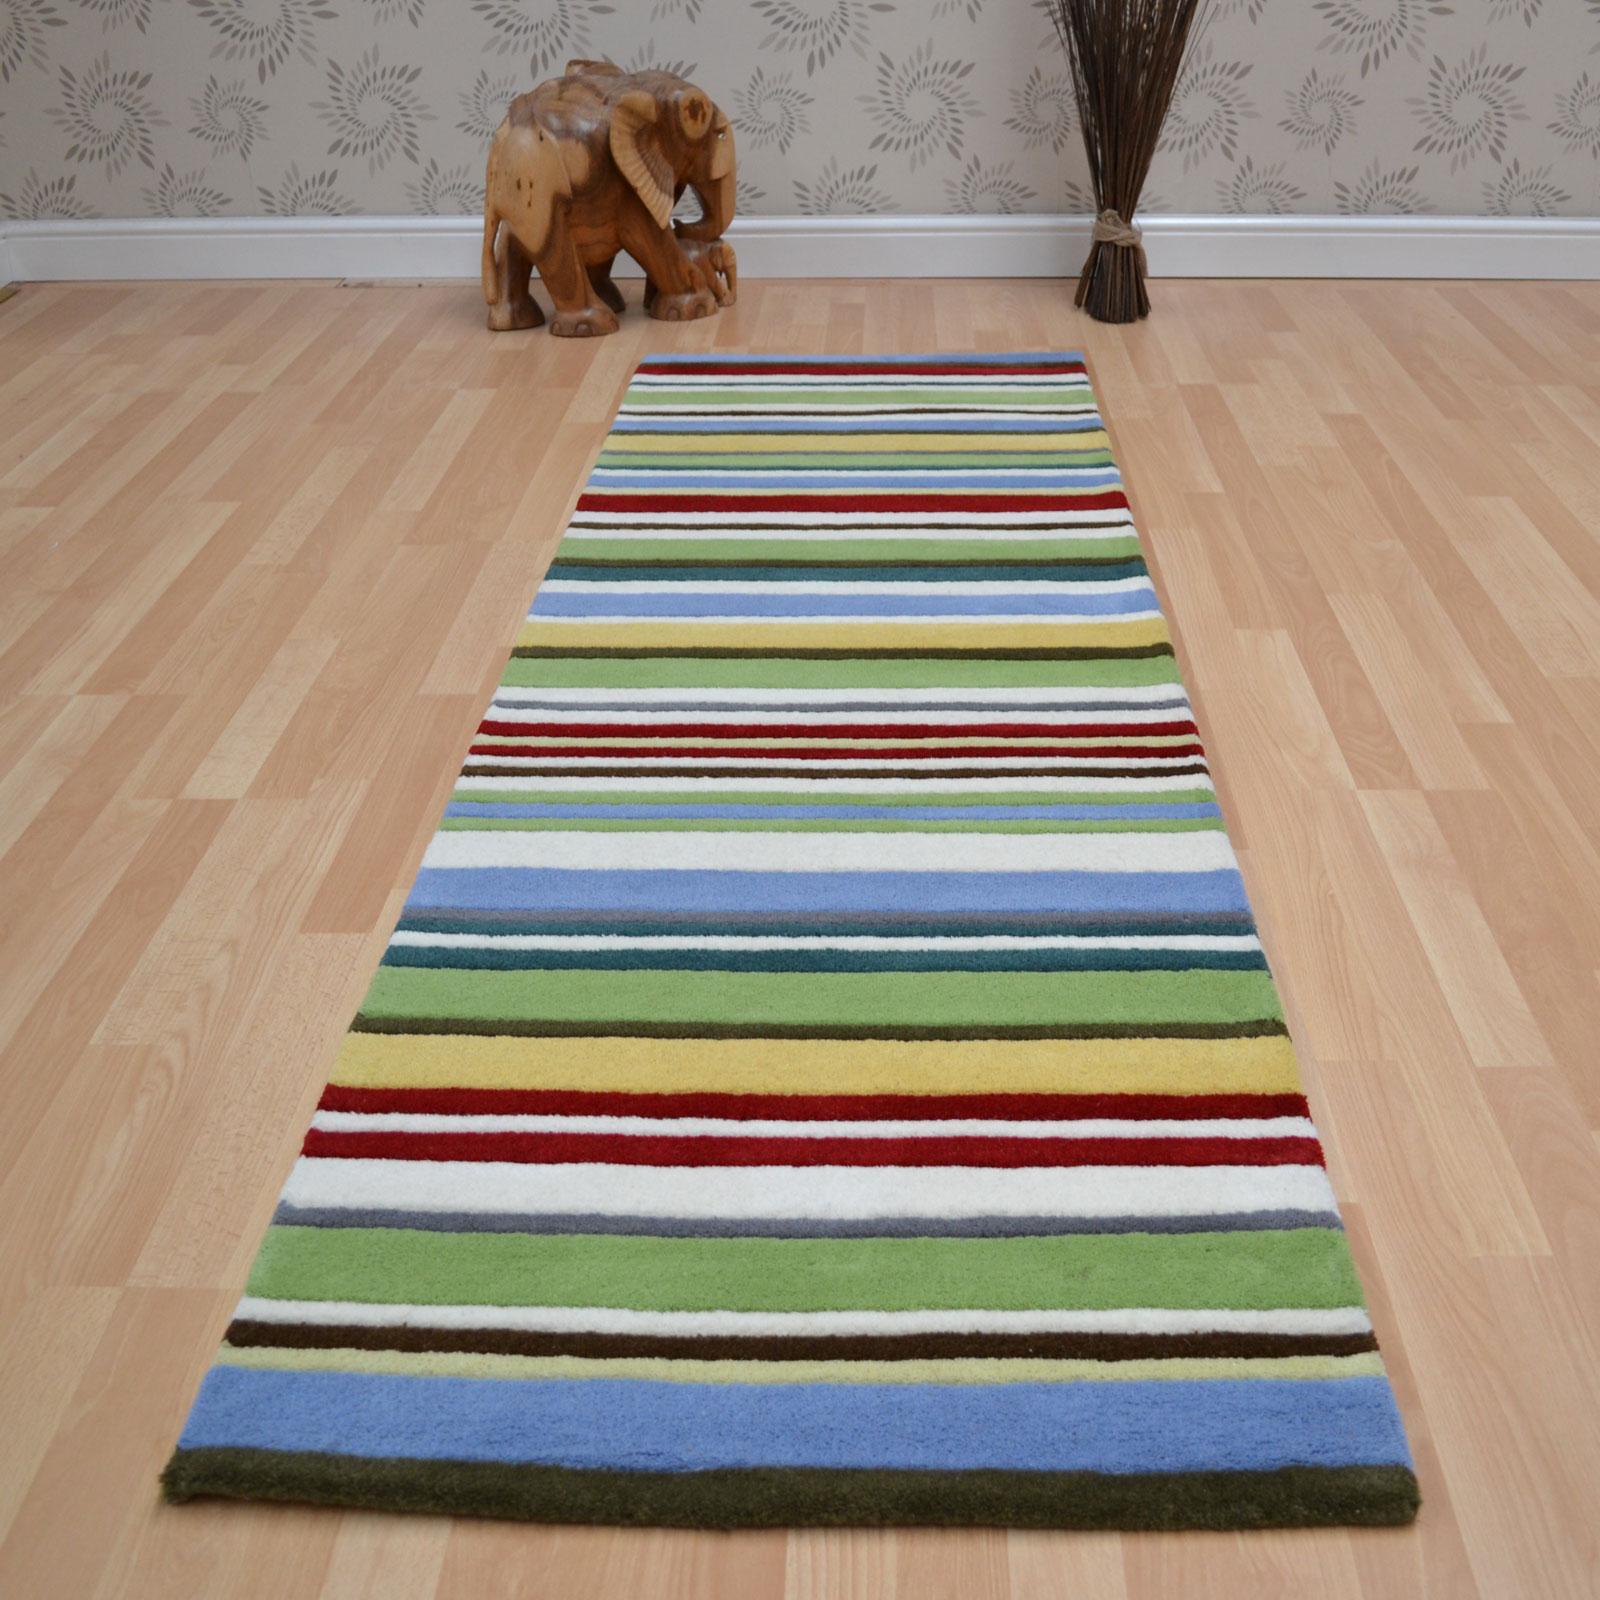 Wool Stripes Hallway Runners In Summer